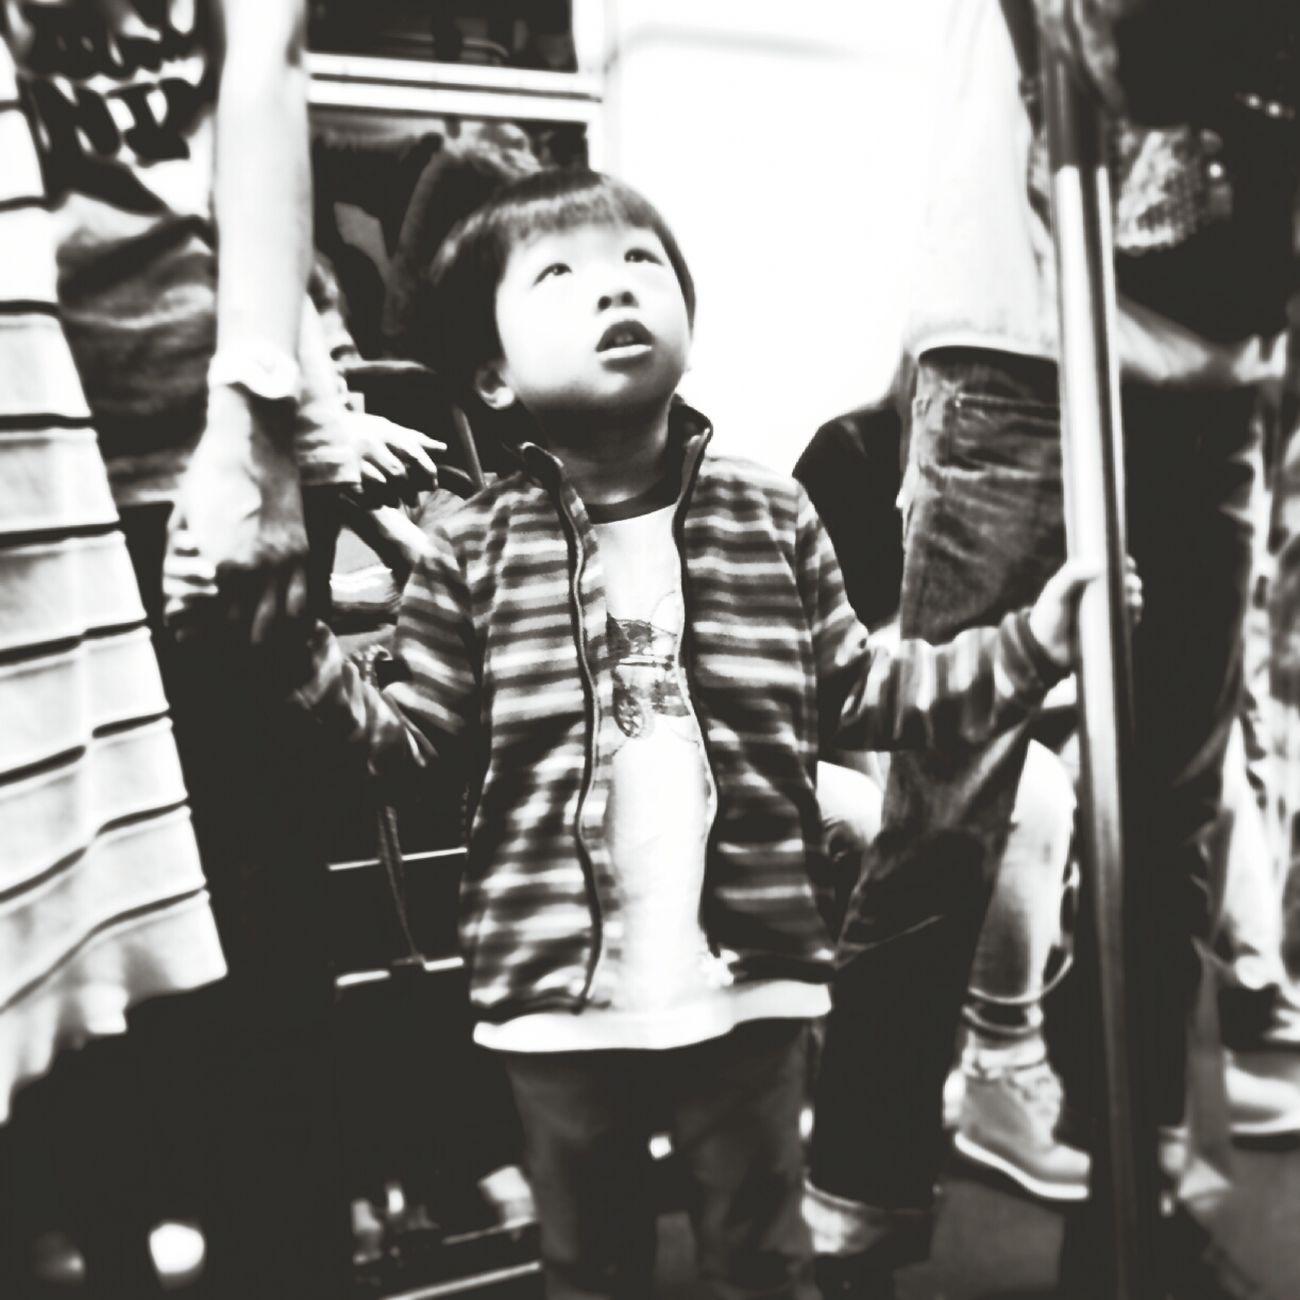 Asian Boy Handrail  EyeEm Gallery Holdingmommyshand